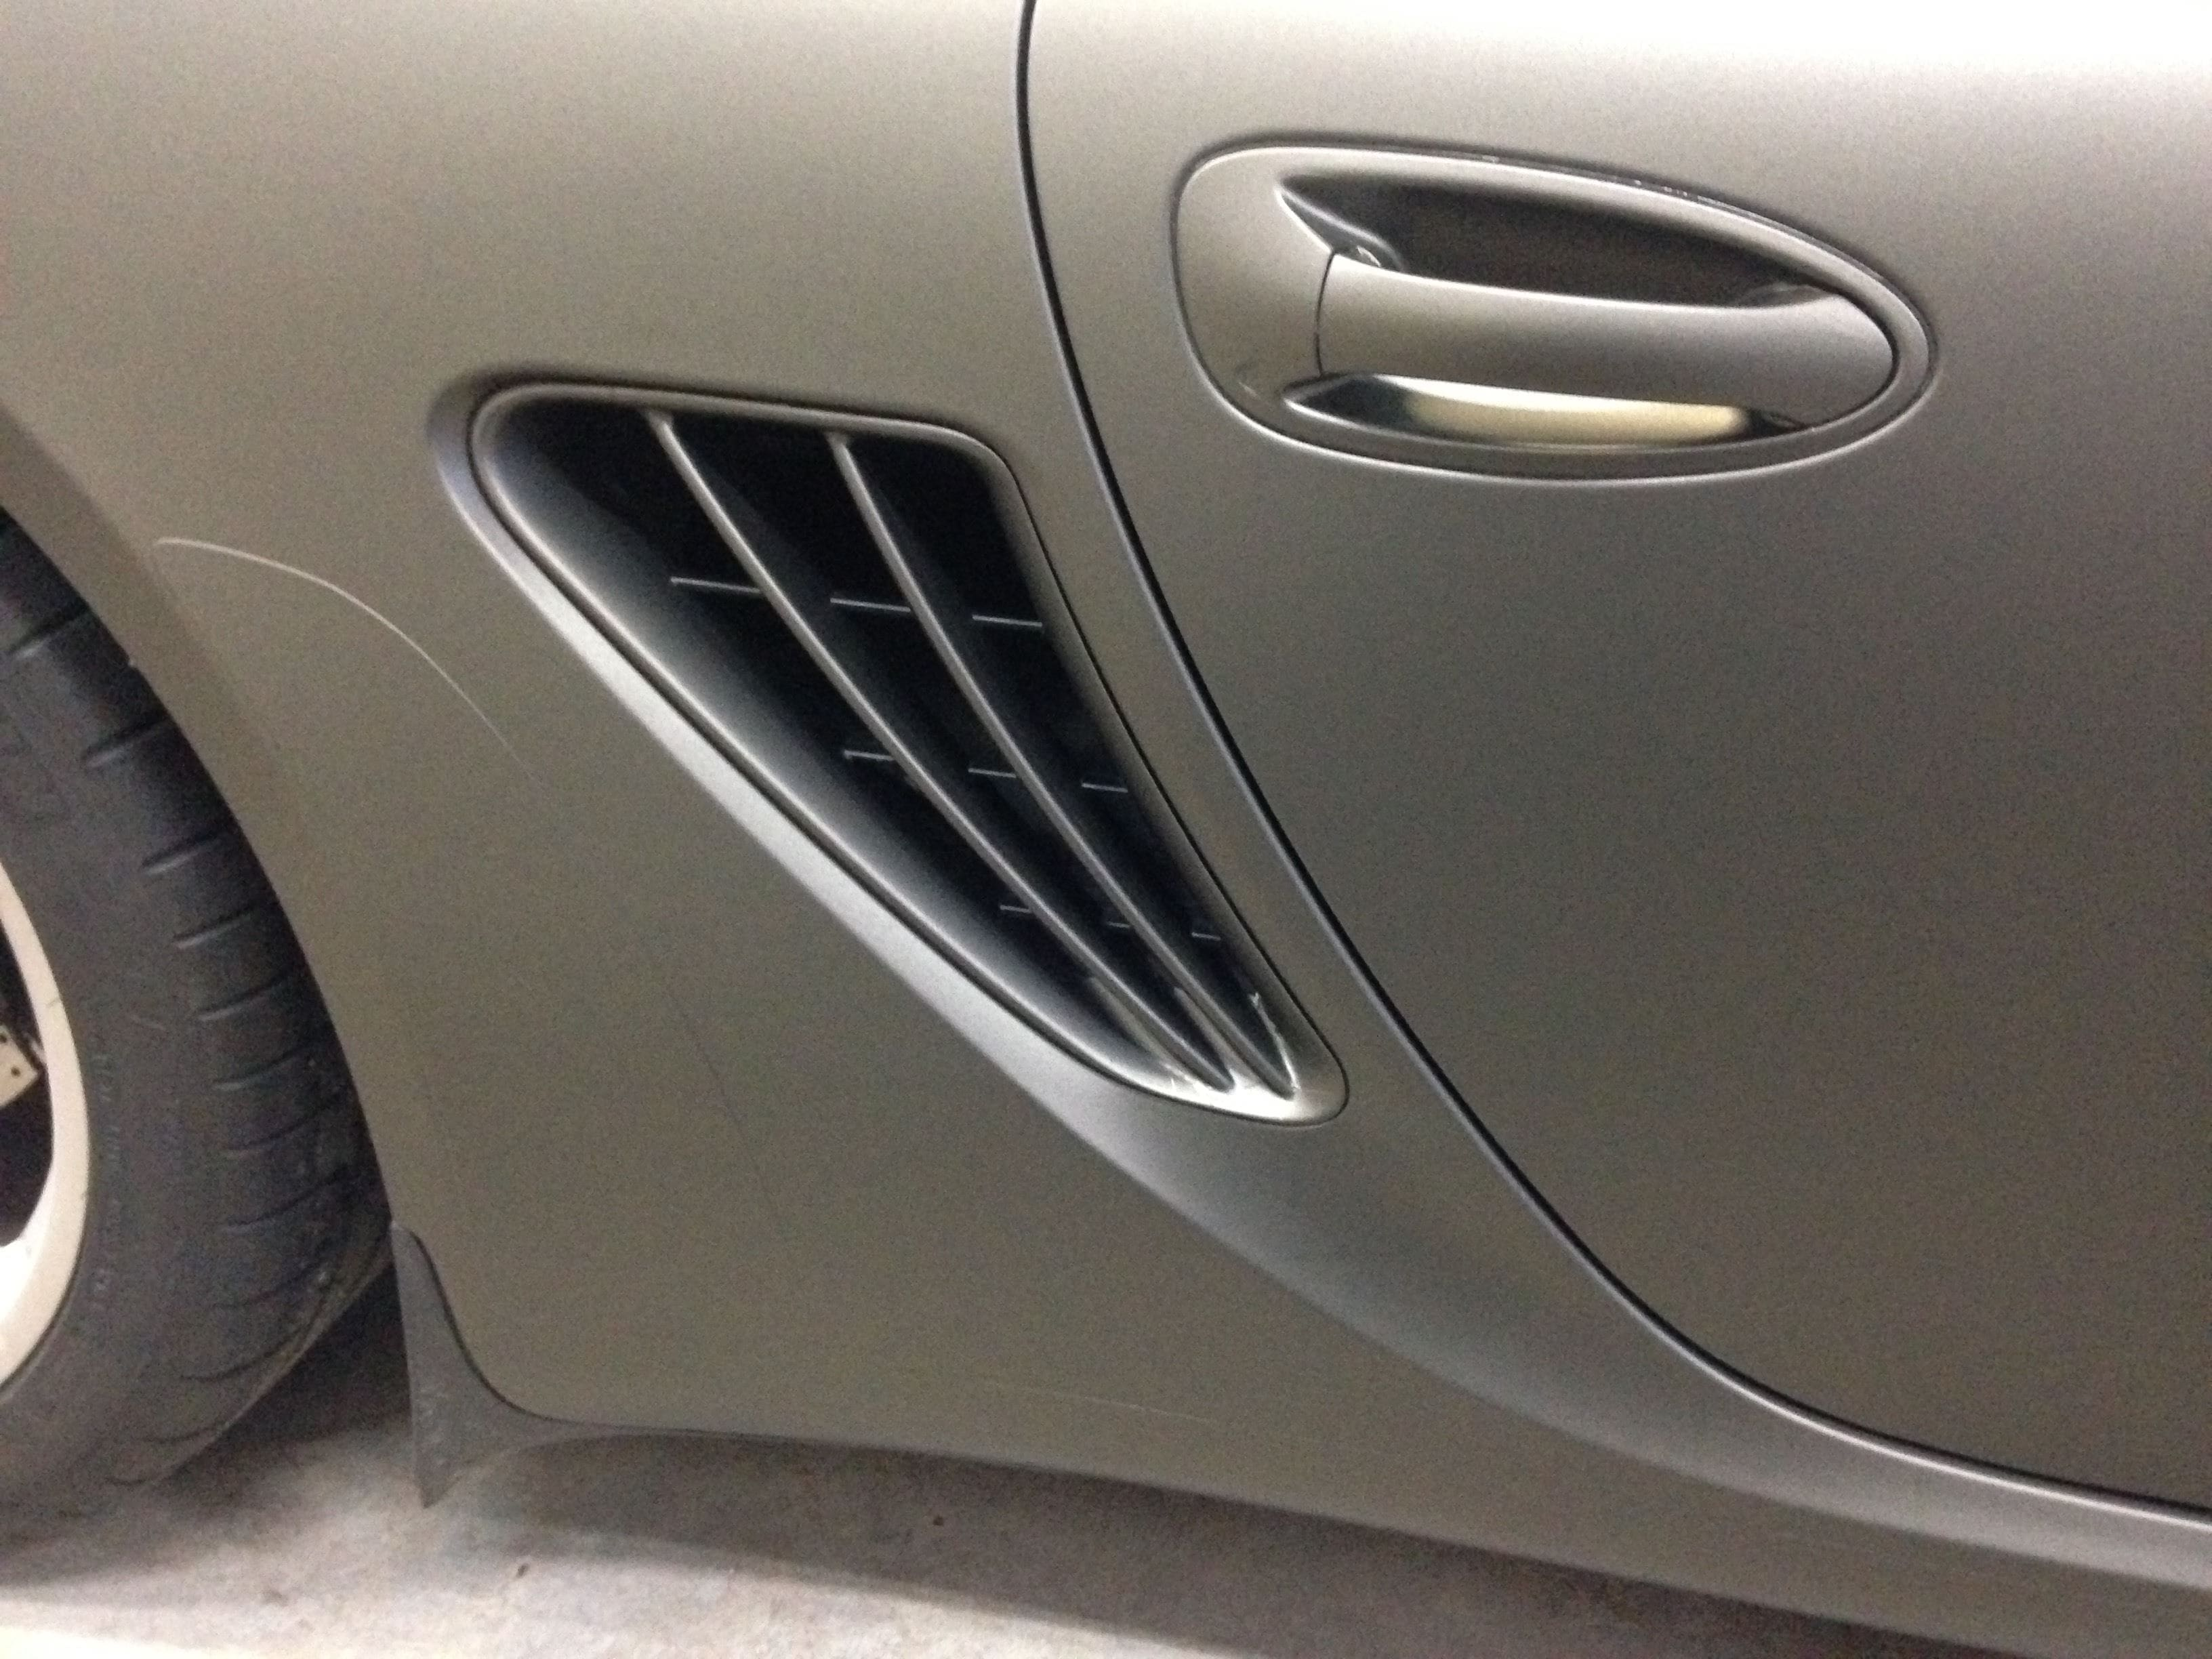 Porsche Cayman met Mat Charcoal Matte Wrap, Carwrapping door Wrapmyride.nu Foto-nr:7101, ©2021